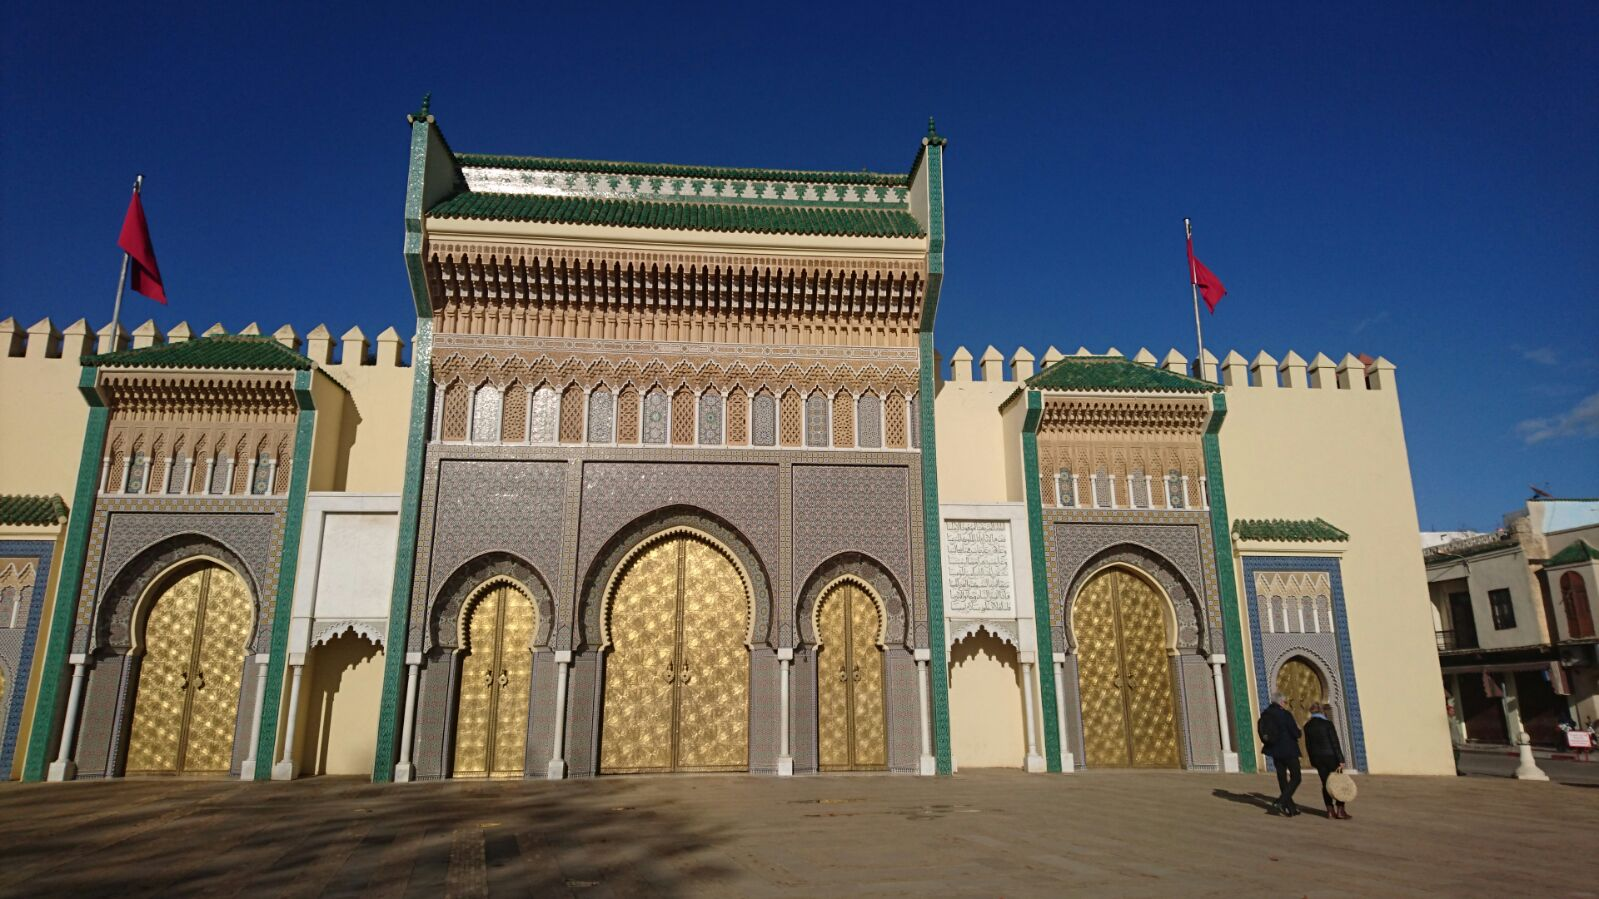 ven y viaja Marruecos te espera